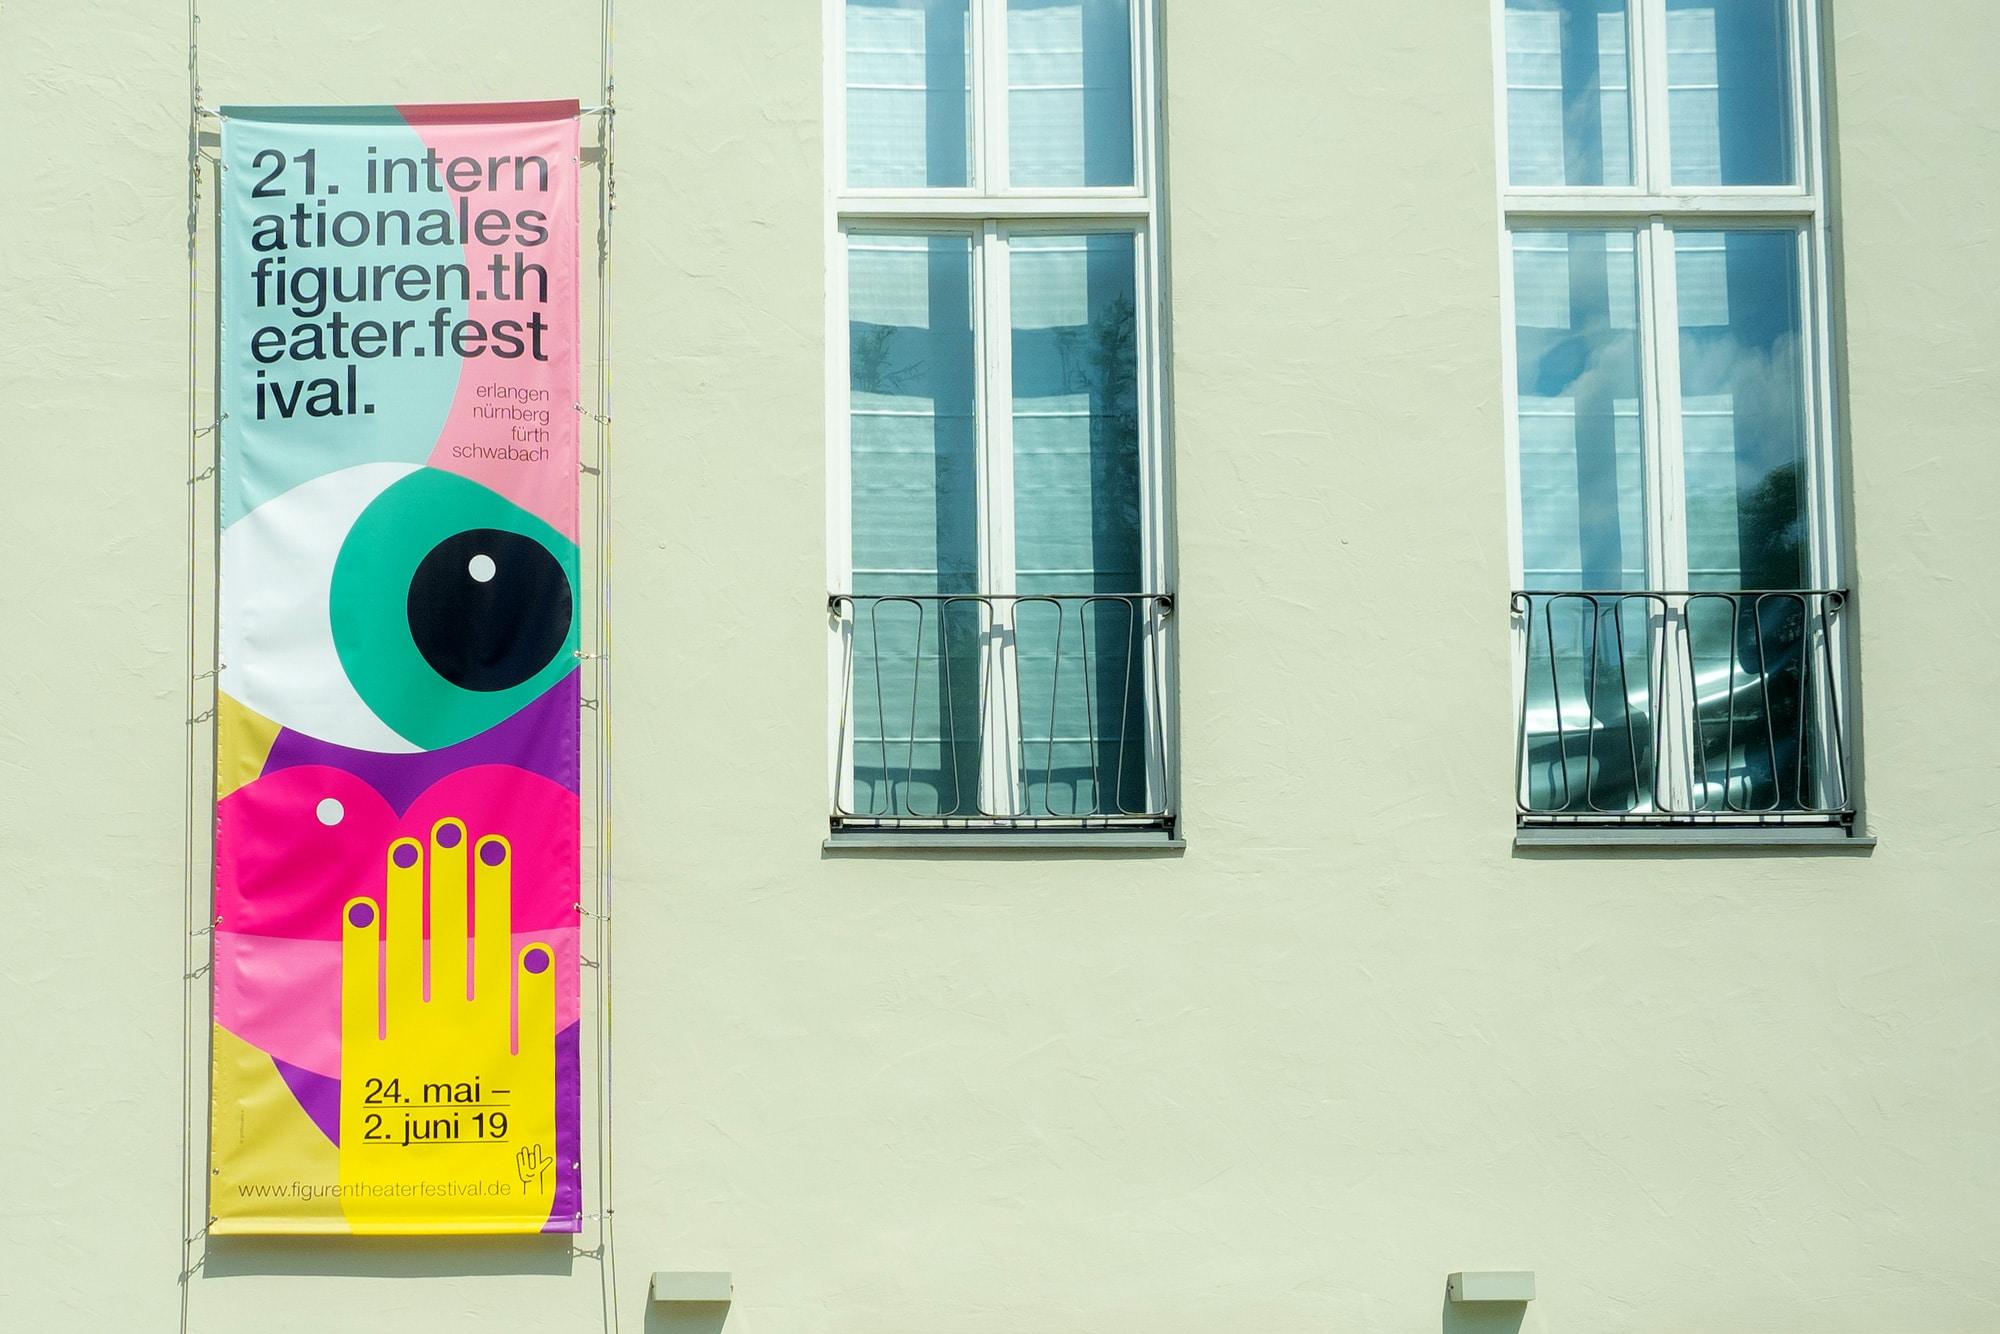 planx-internationales.figuren.theater.festival-04